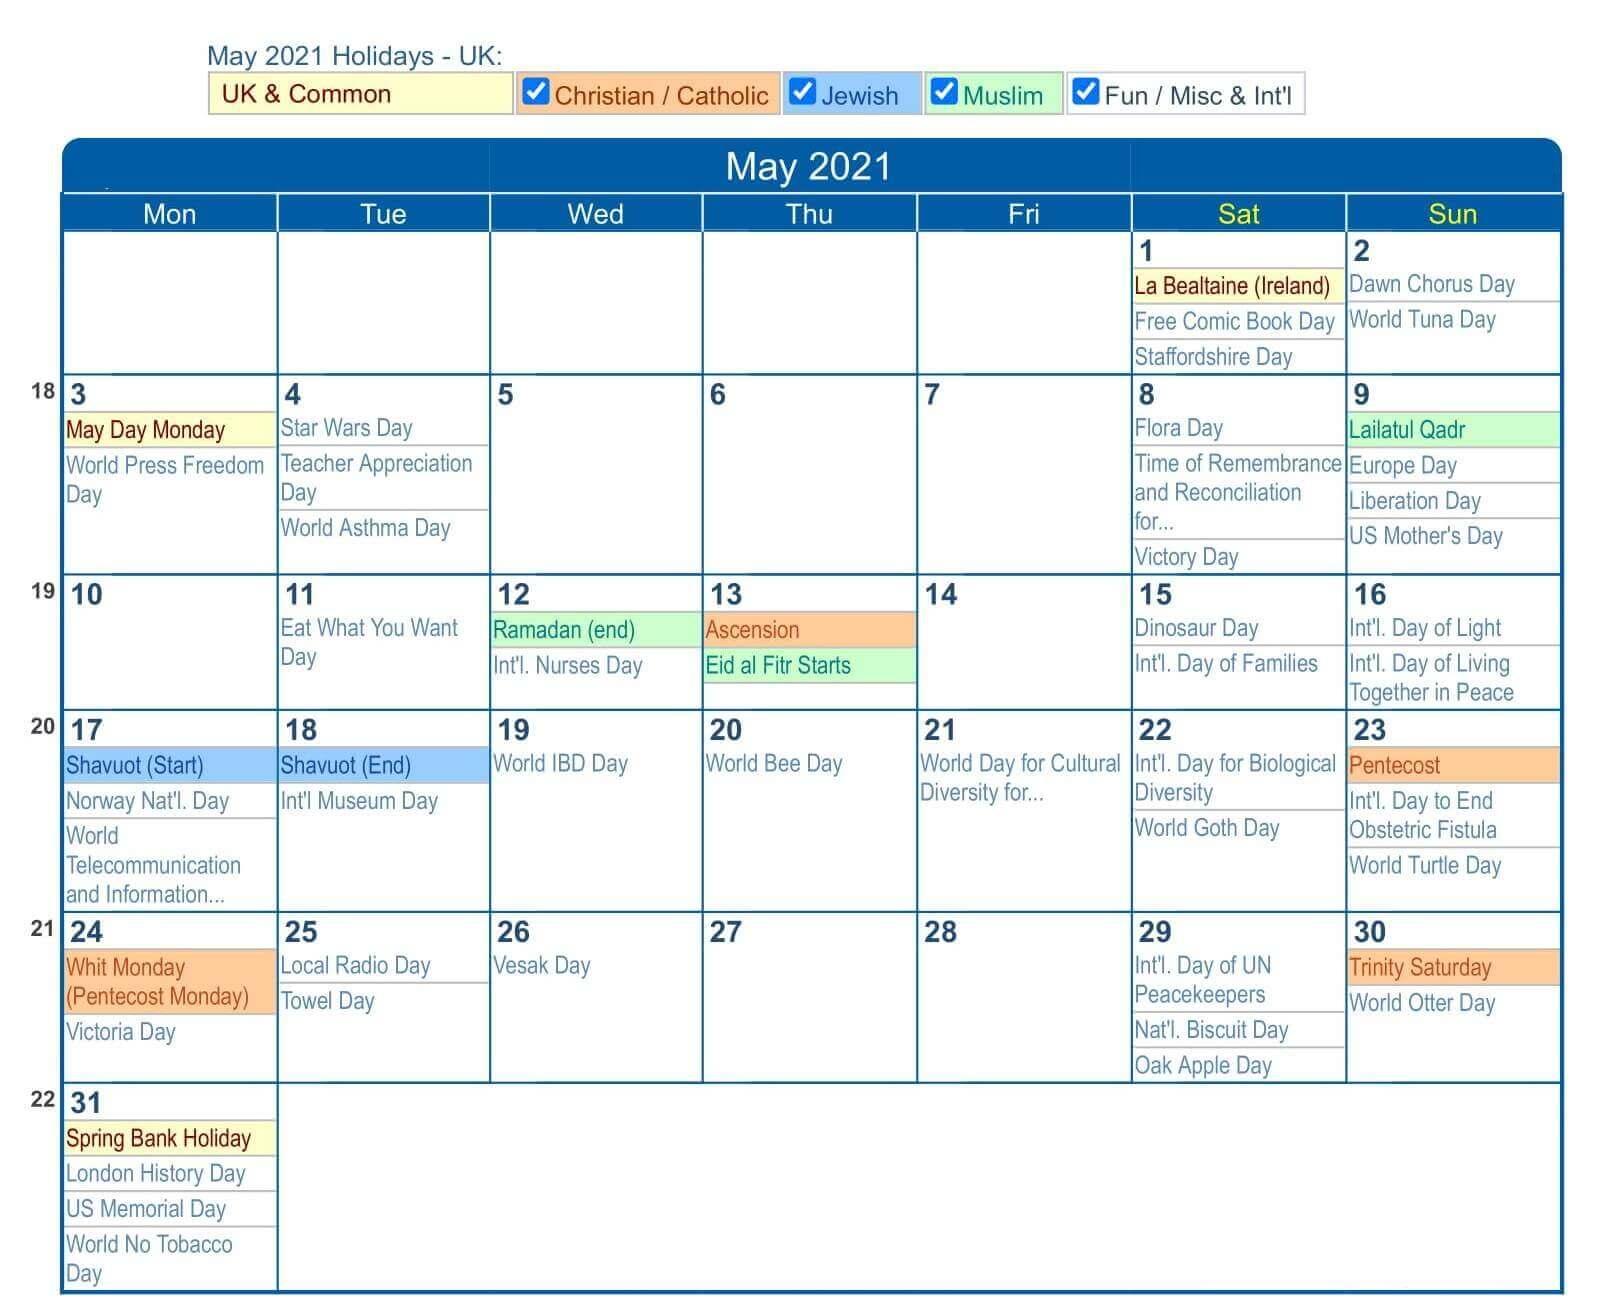 May 2021 UK Holidays Calendar